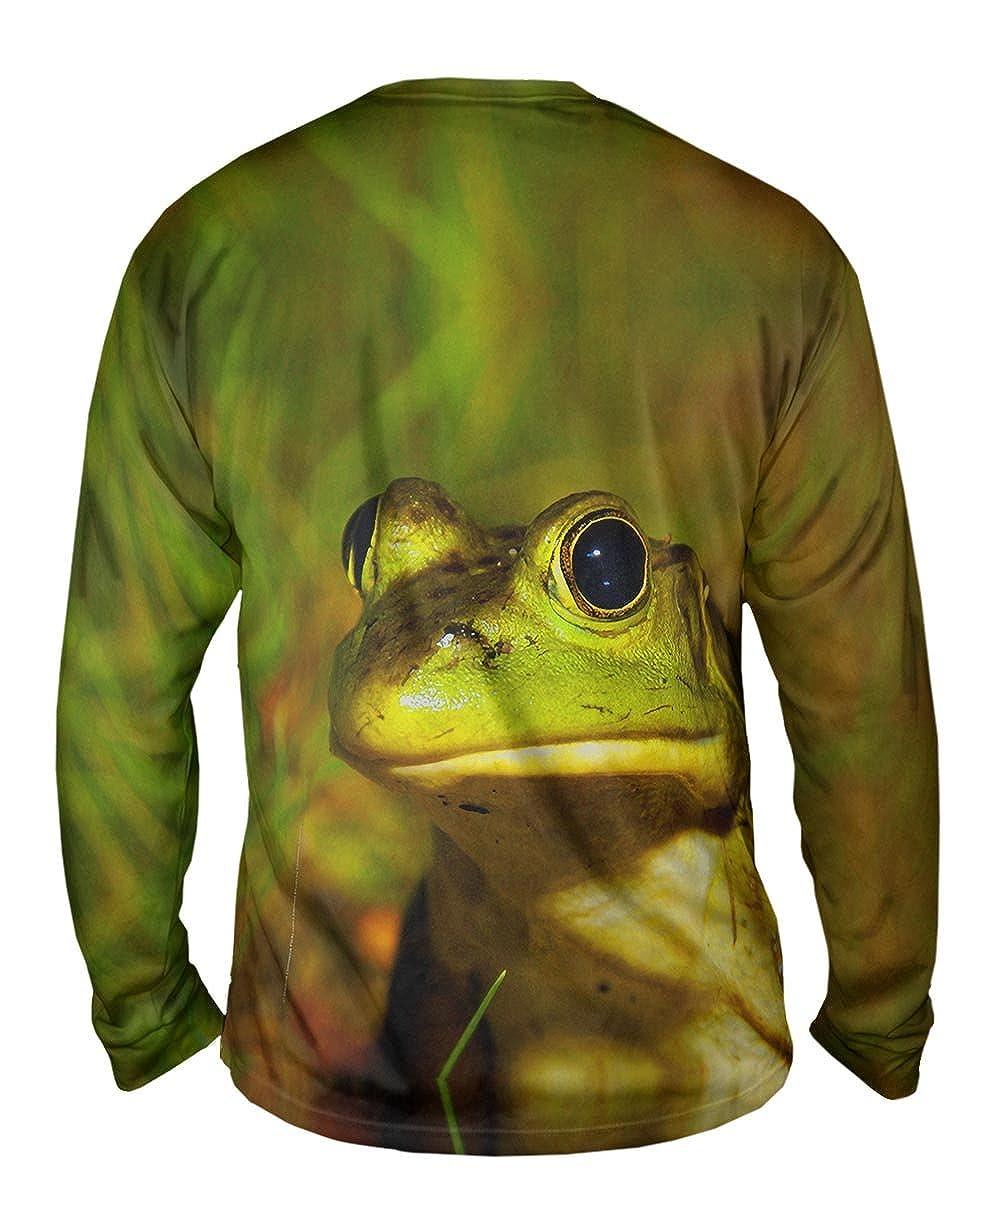 Yizzam Lively Bull Frog Mens Long Sleeve TShirt